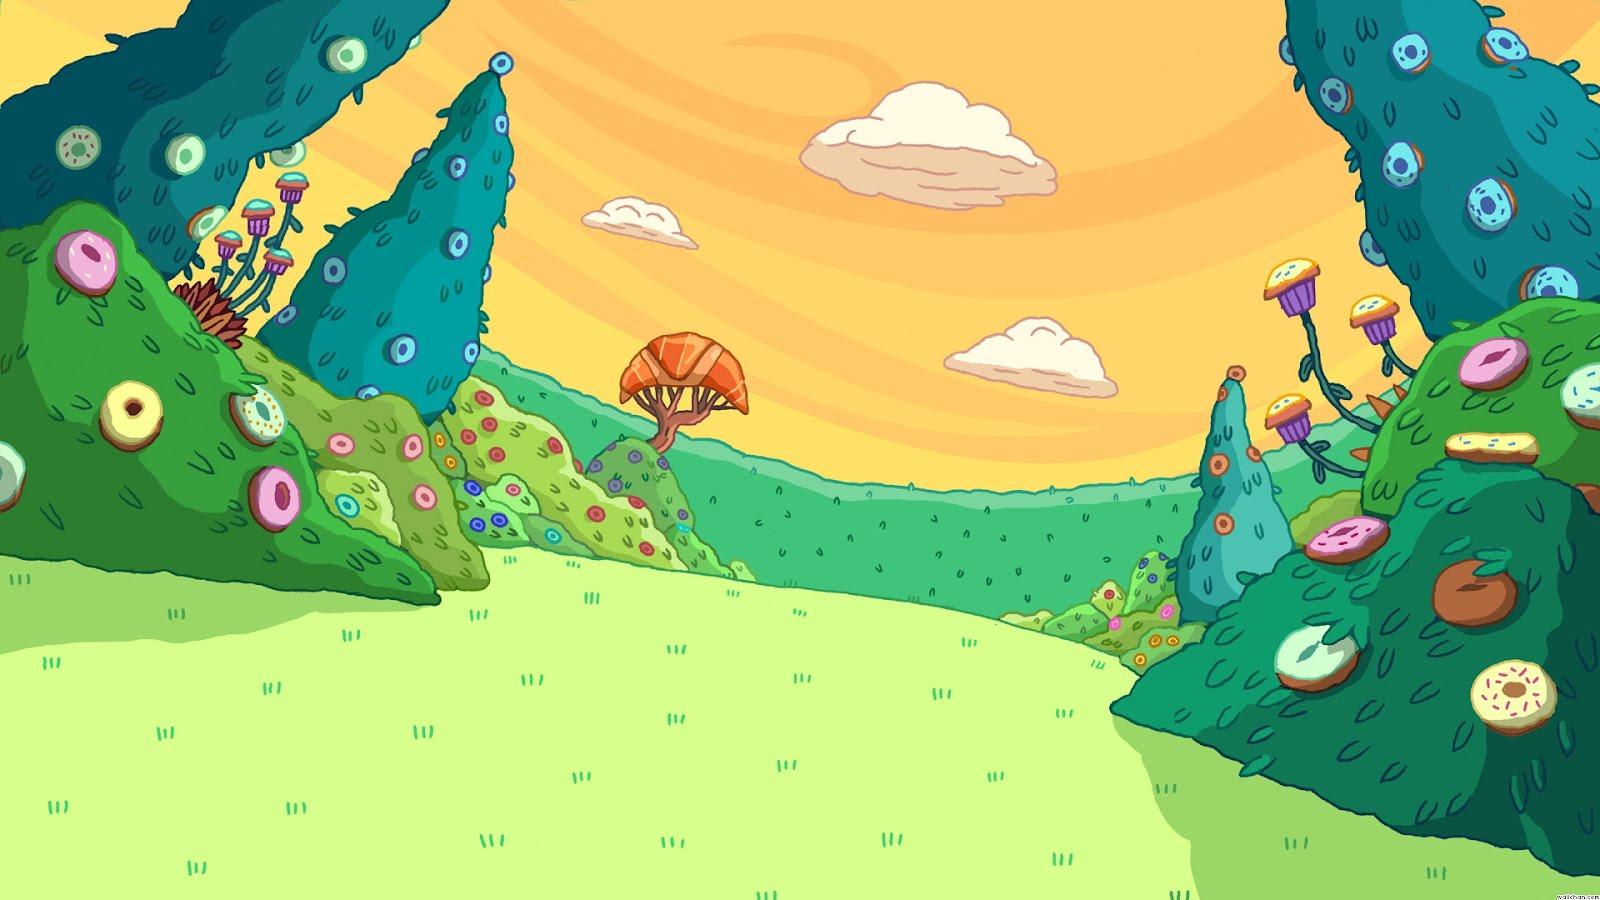 Cosas De Kiko Adventure Time Wallpapers 1280x1024